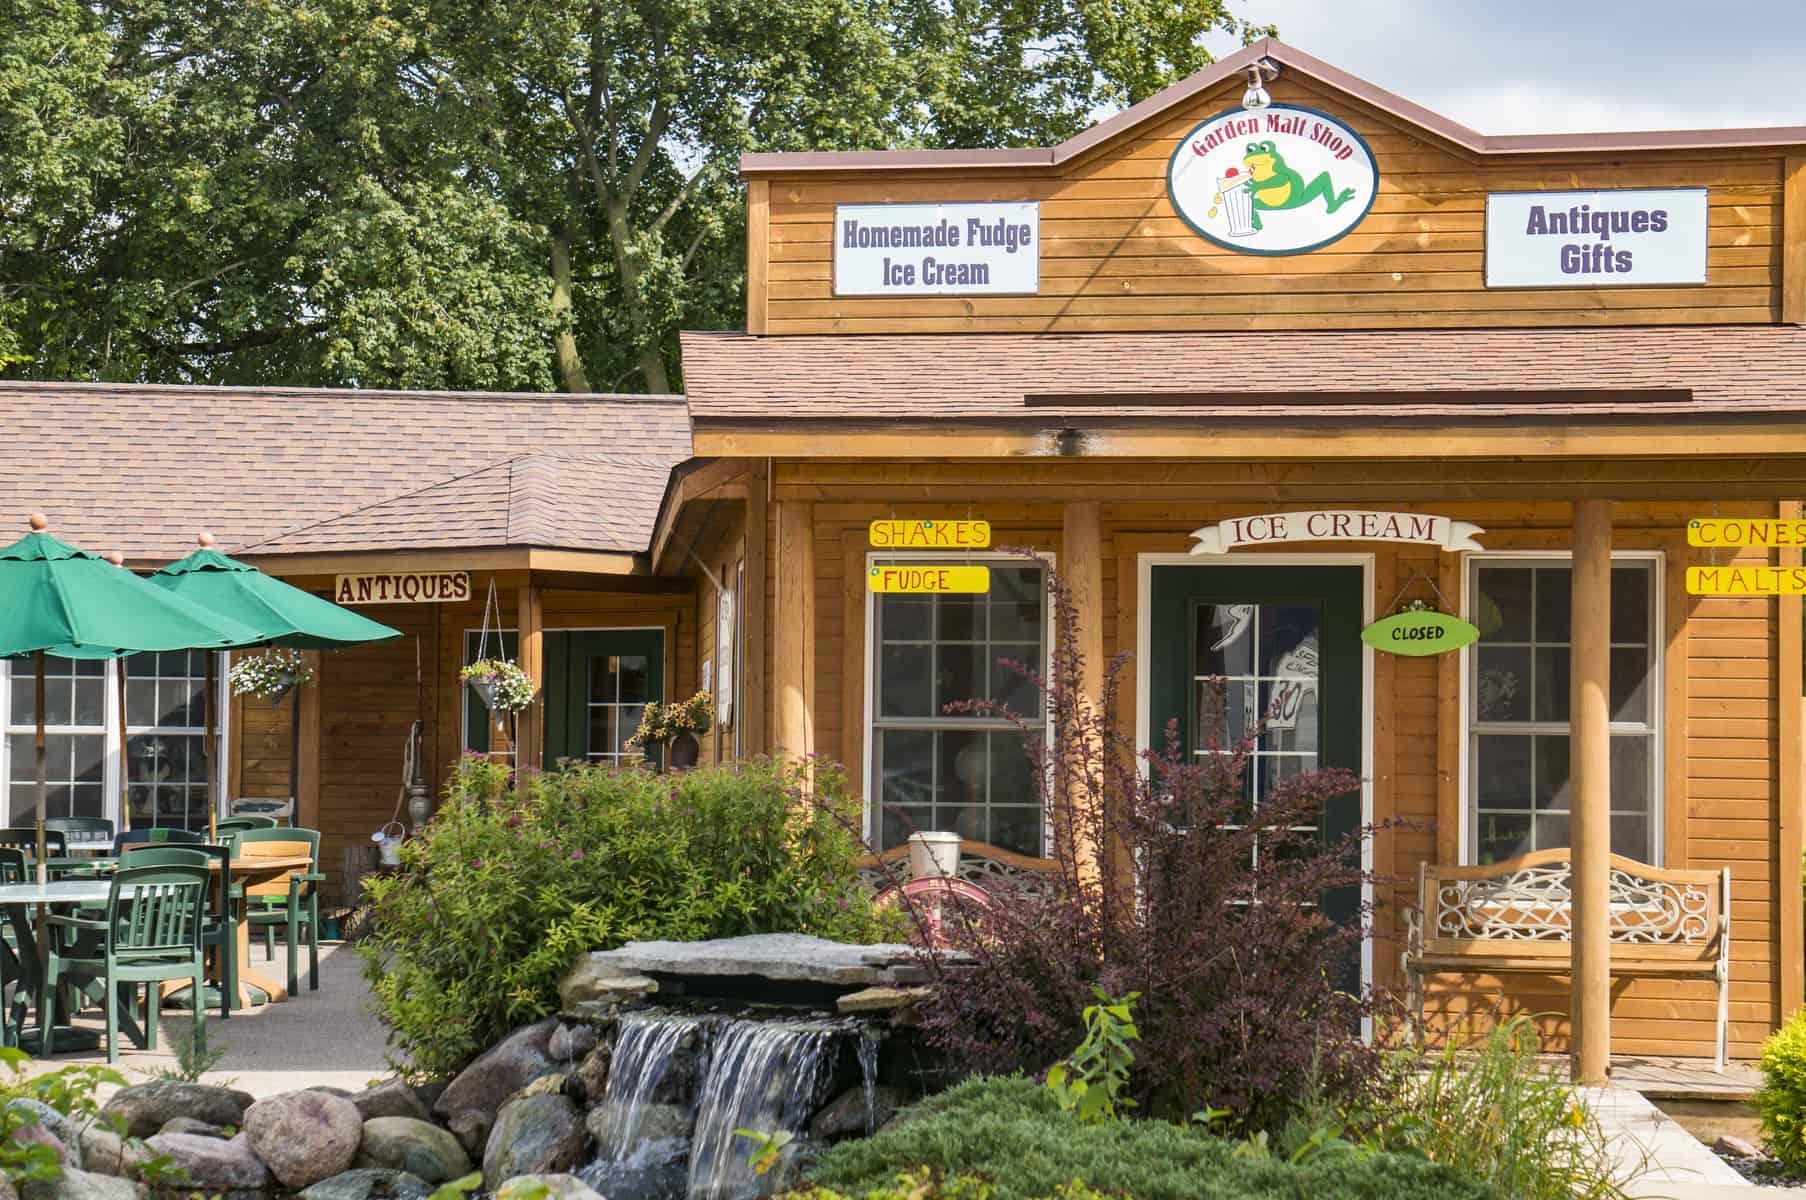 Garden Pub Malt Shop